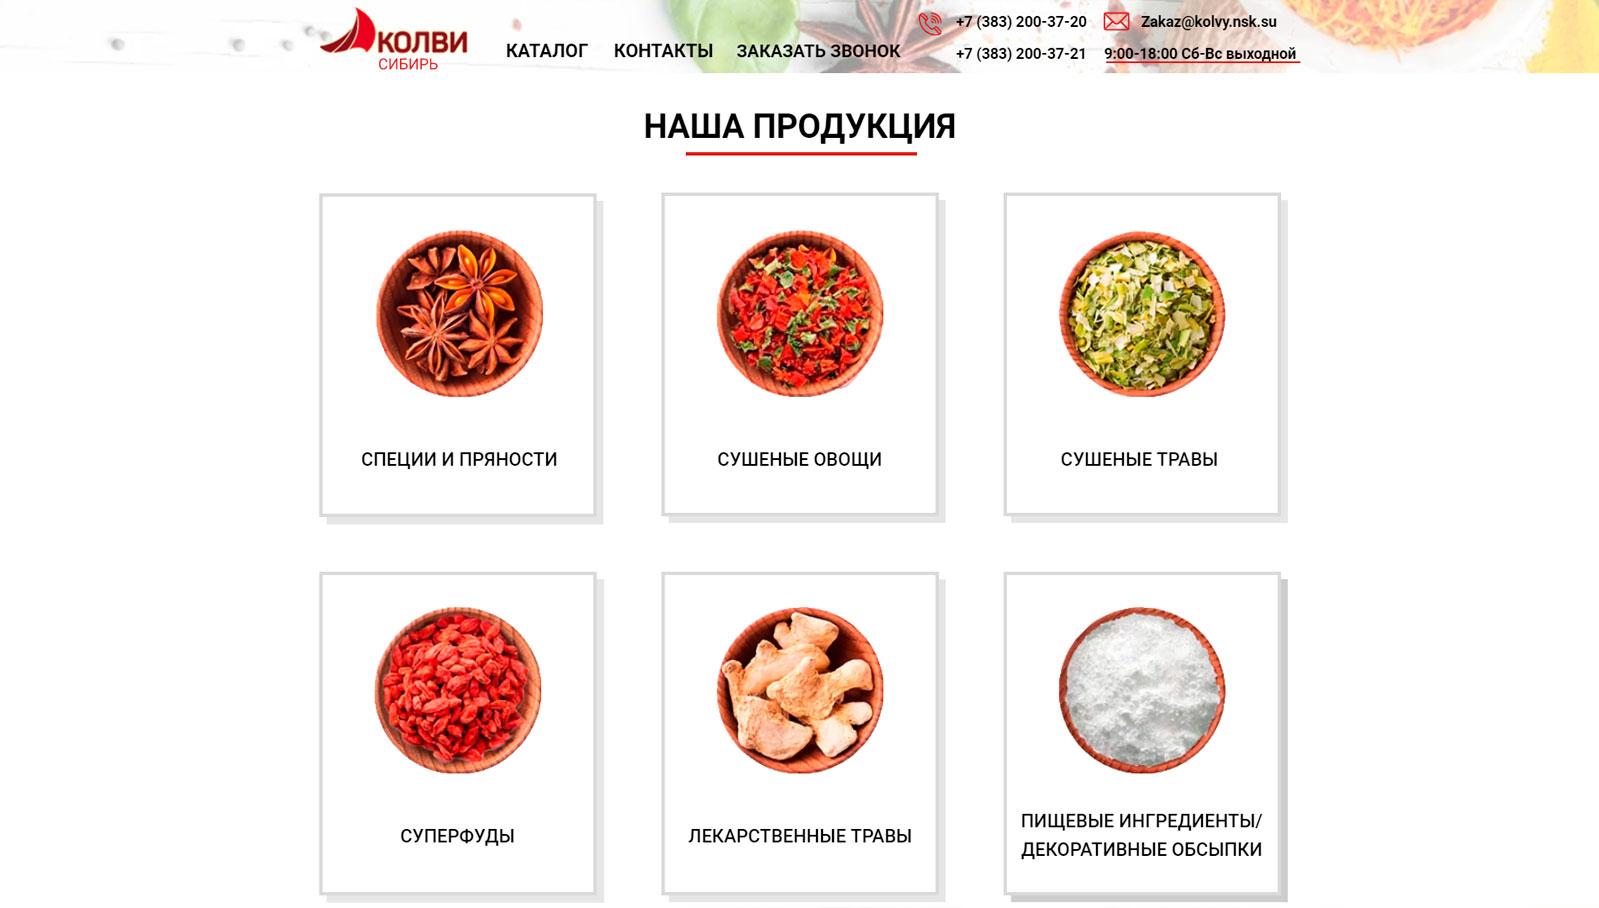 SPS_sajt_kolvy-sib.ru2